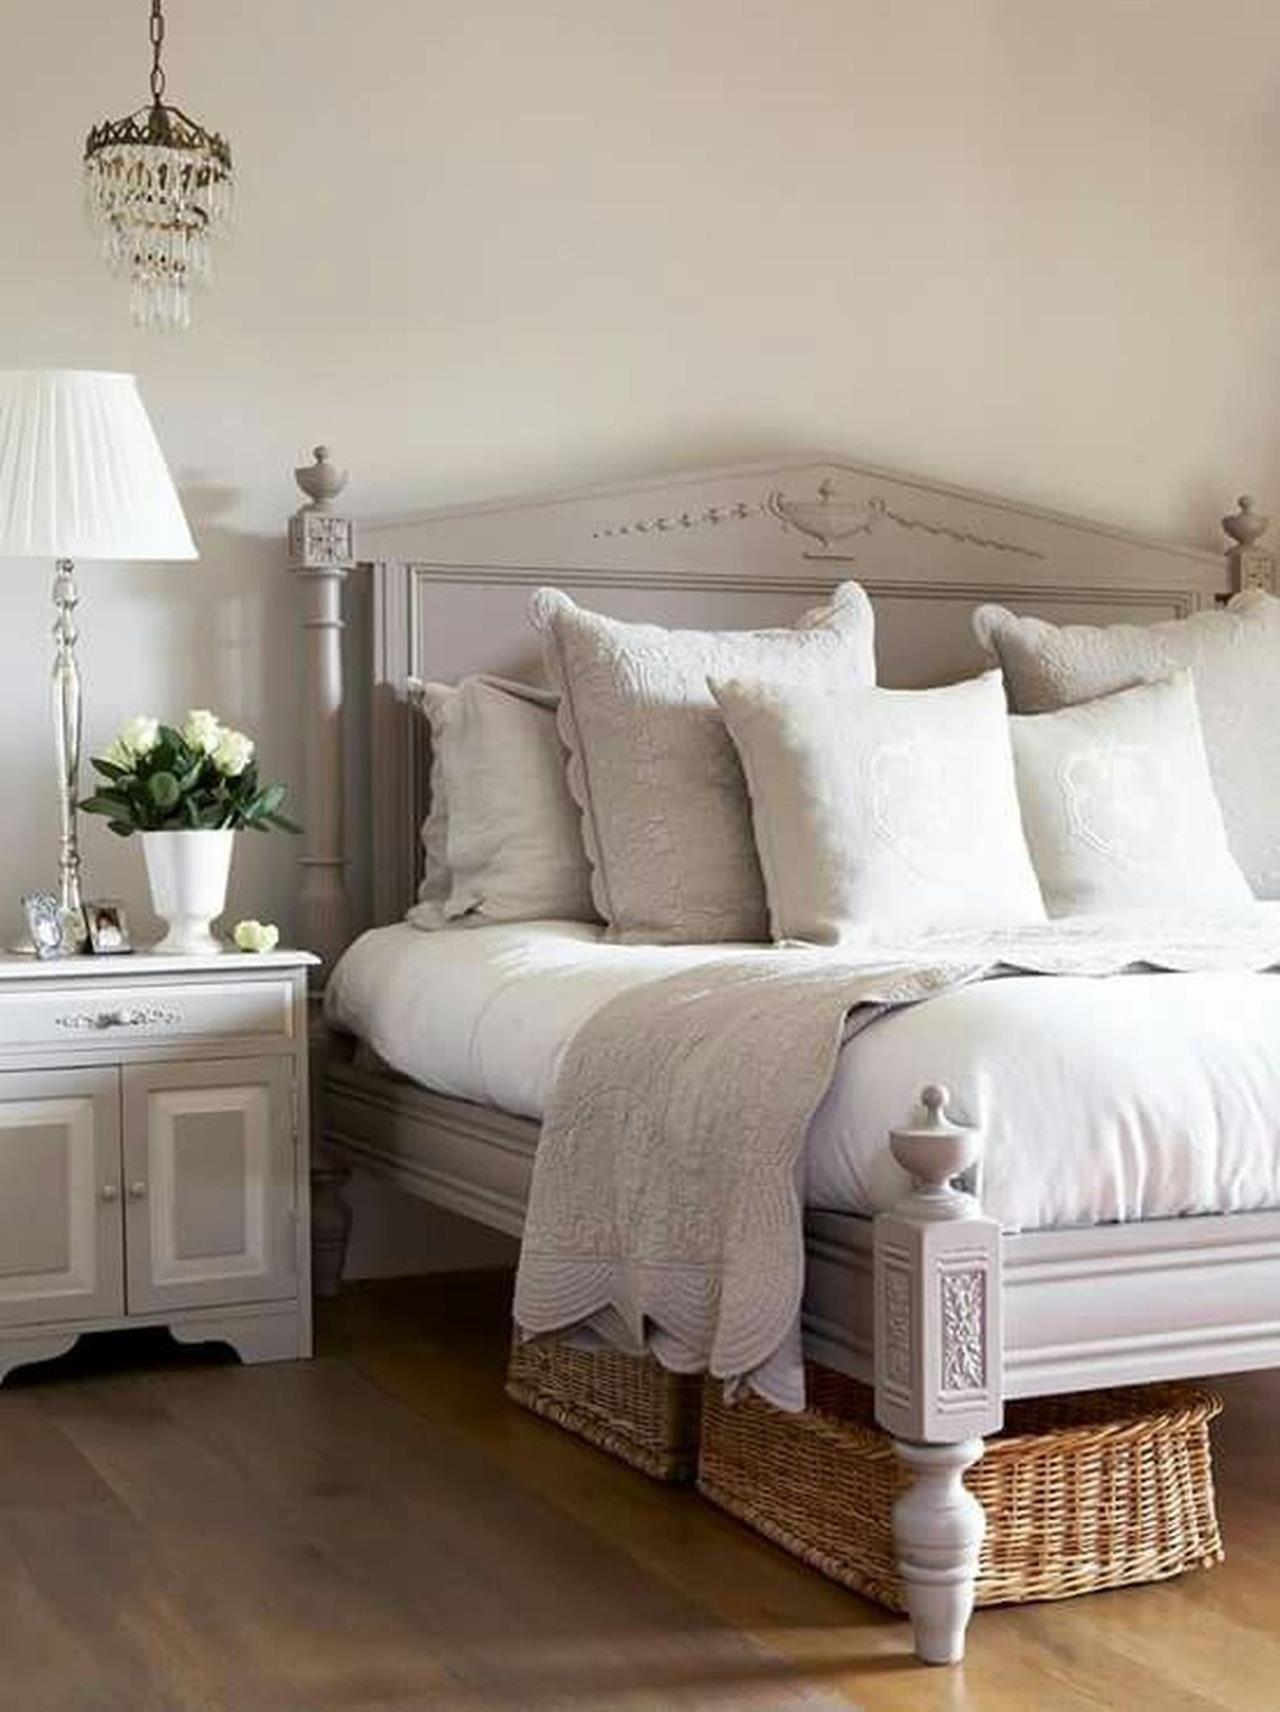 Vintage master bedroom decor  Vintage Farmhouse Bedroom Decorating Ideas   Bedrooms  Pinterest